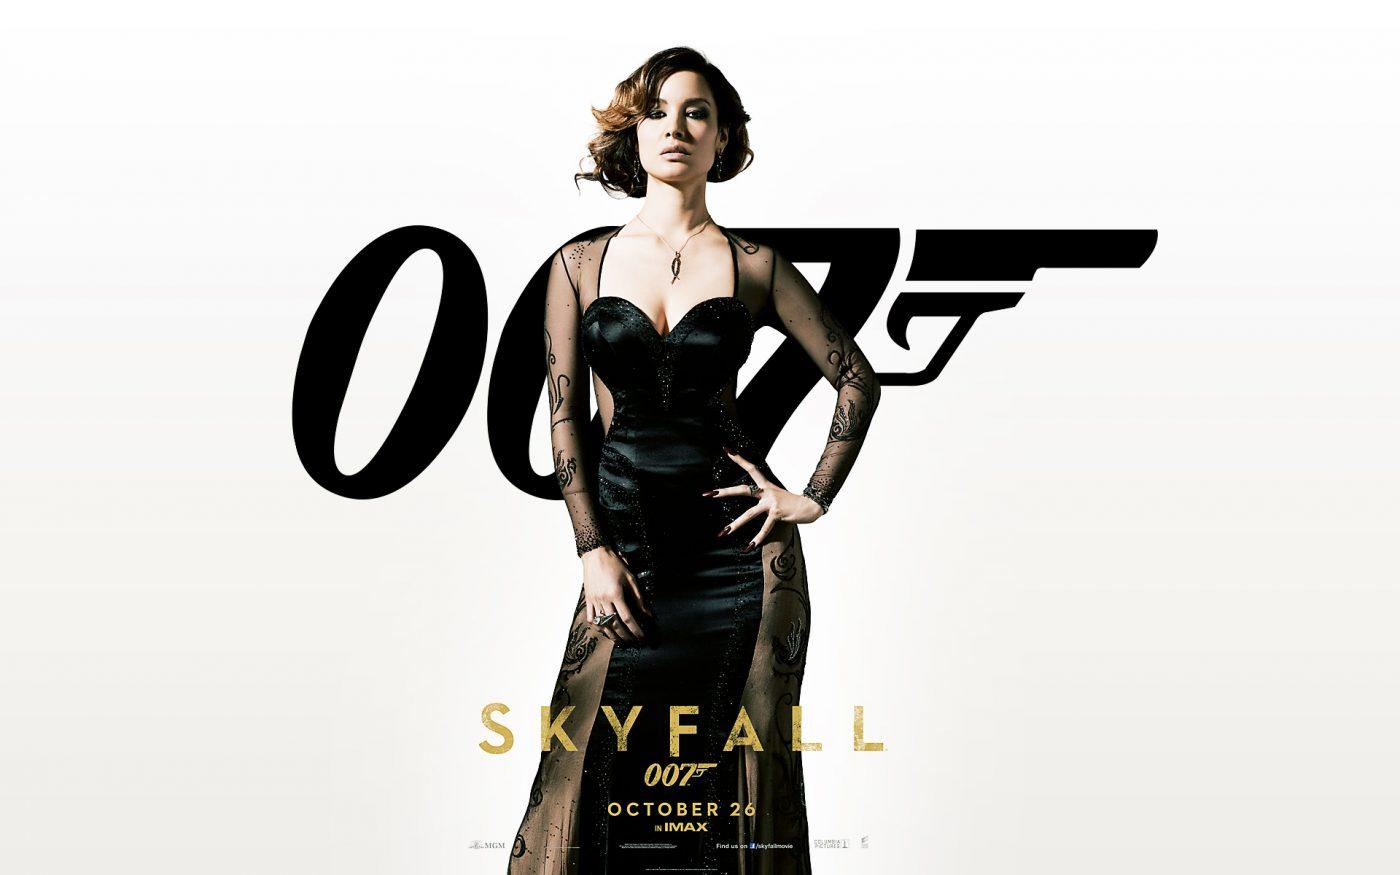 Get the skyfall look how to be a bond girl makeup 101 - Deguisement james bond girl ...